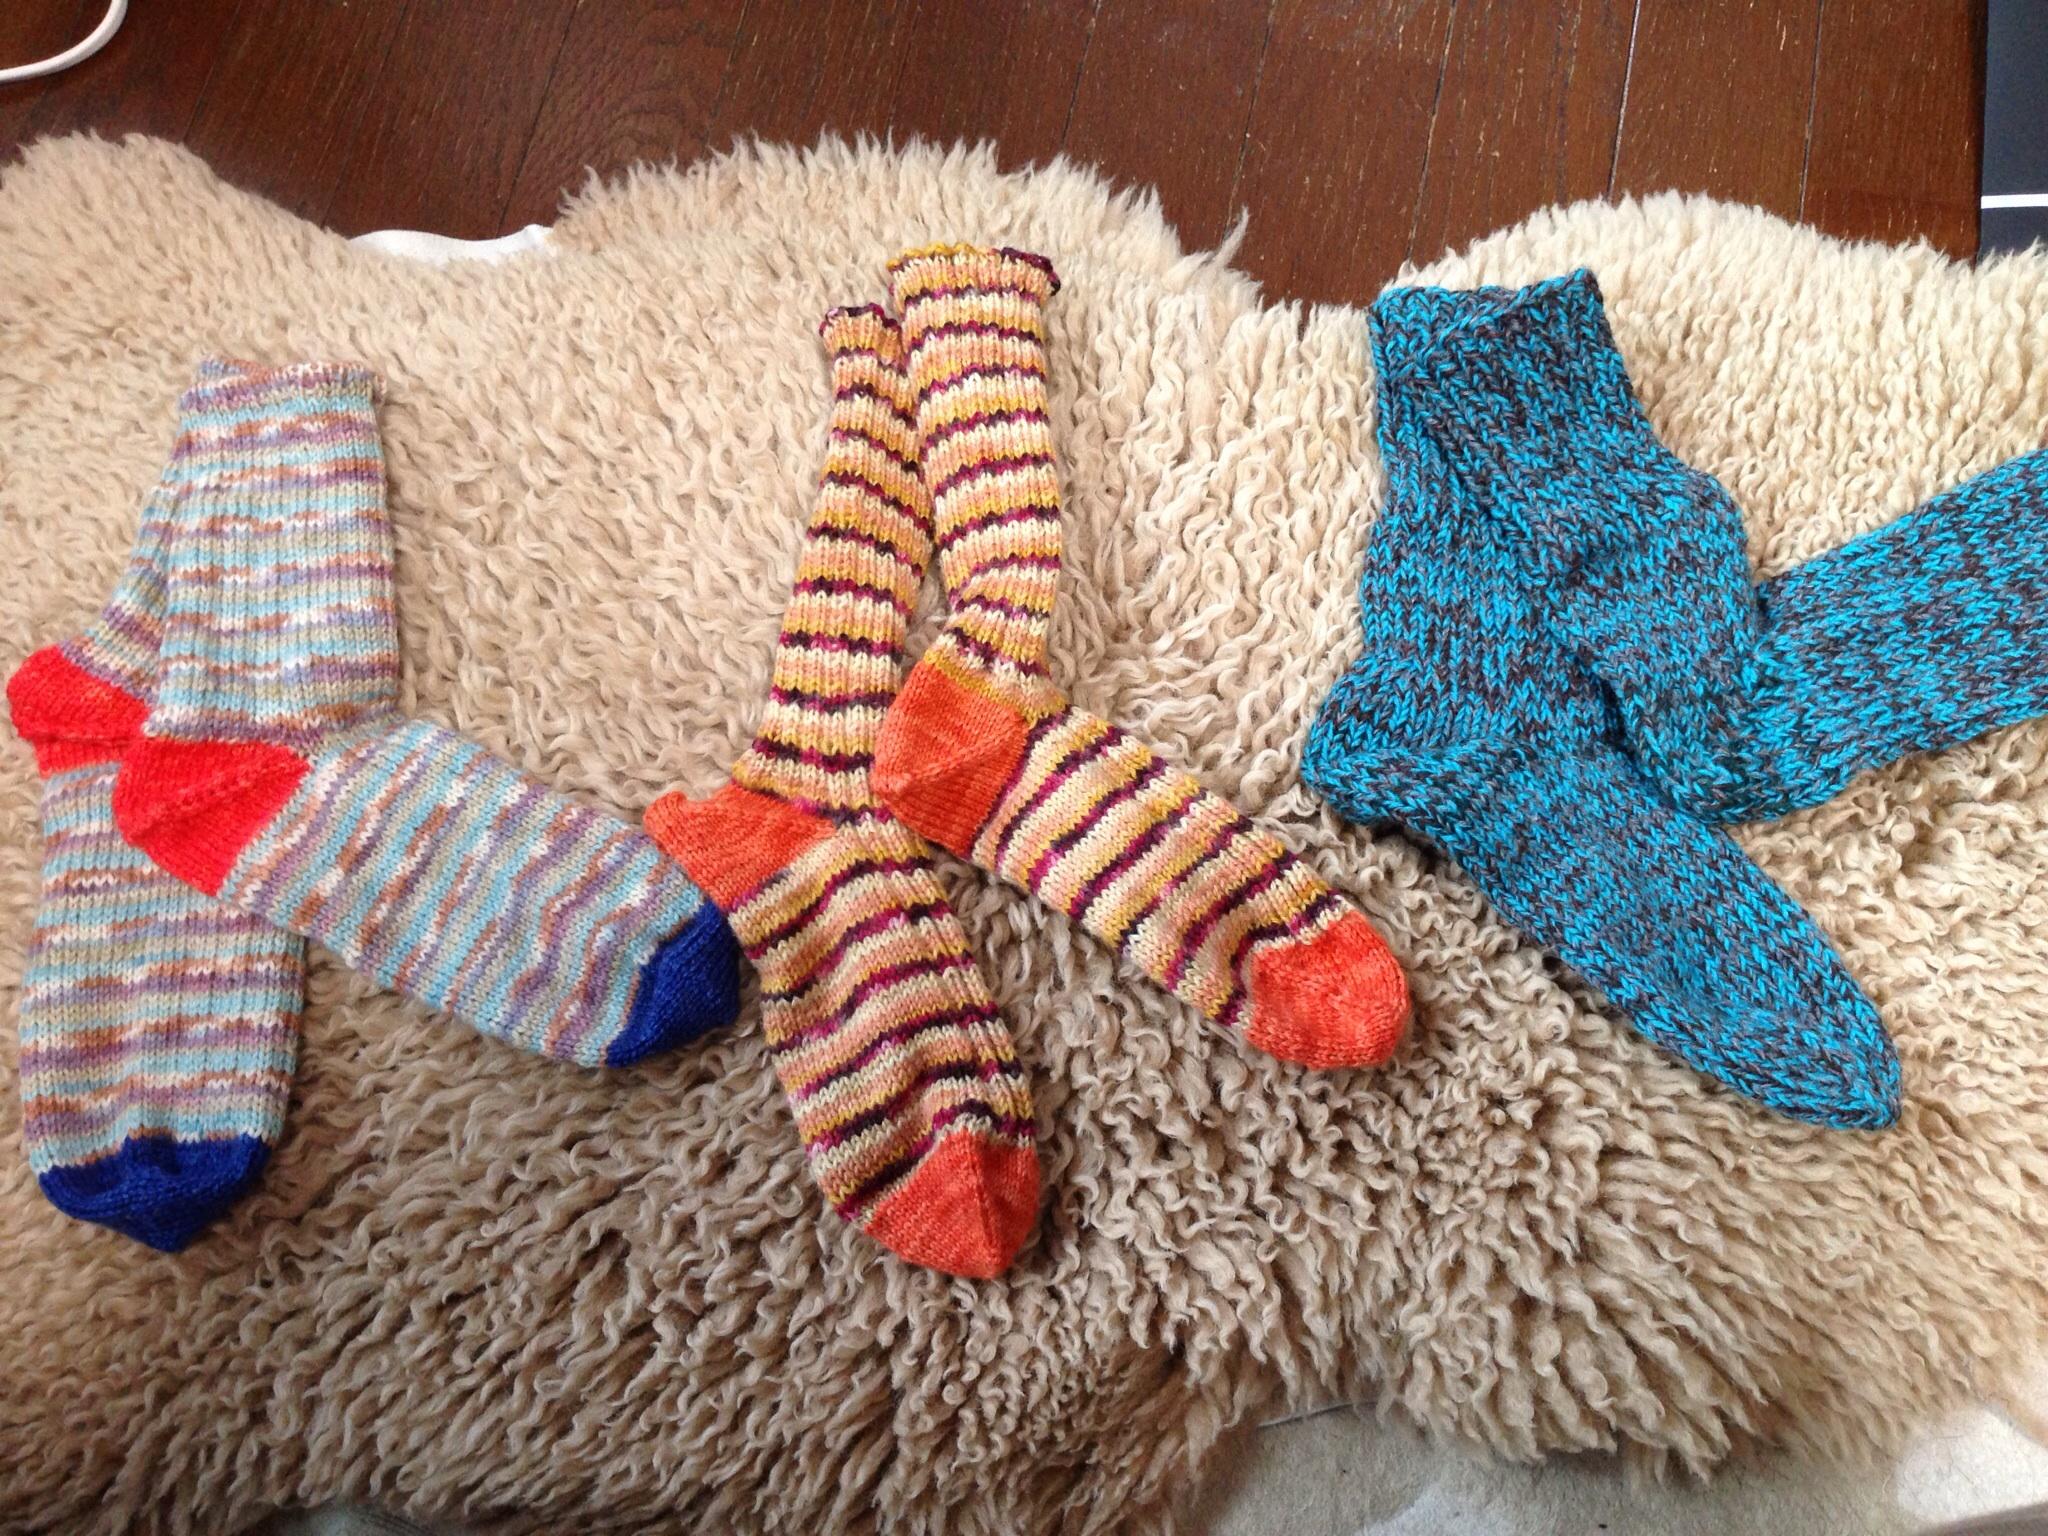 Knitting With Handspun : Knitting with handspun靴下